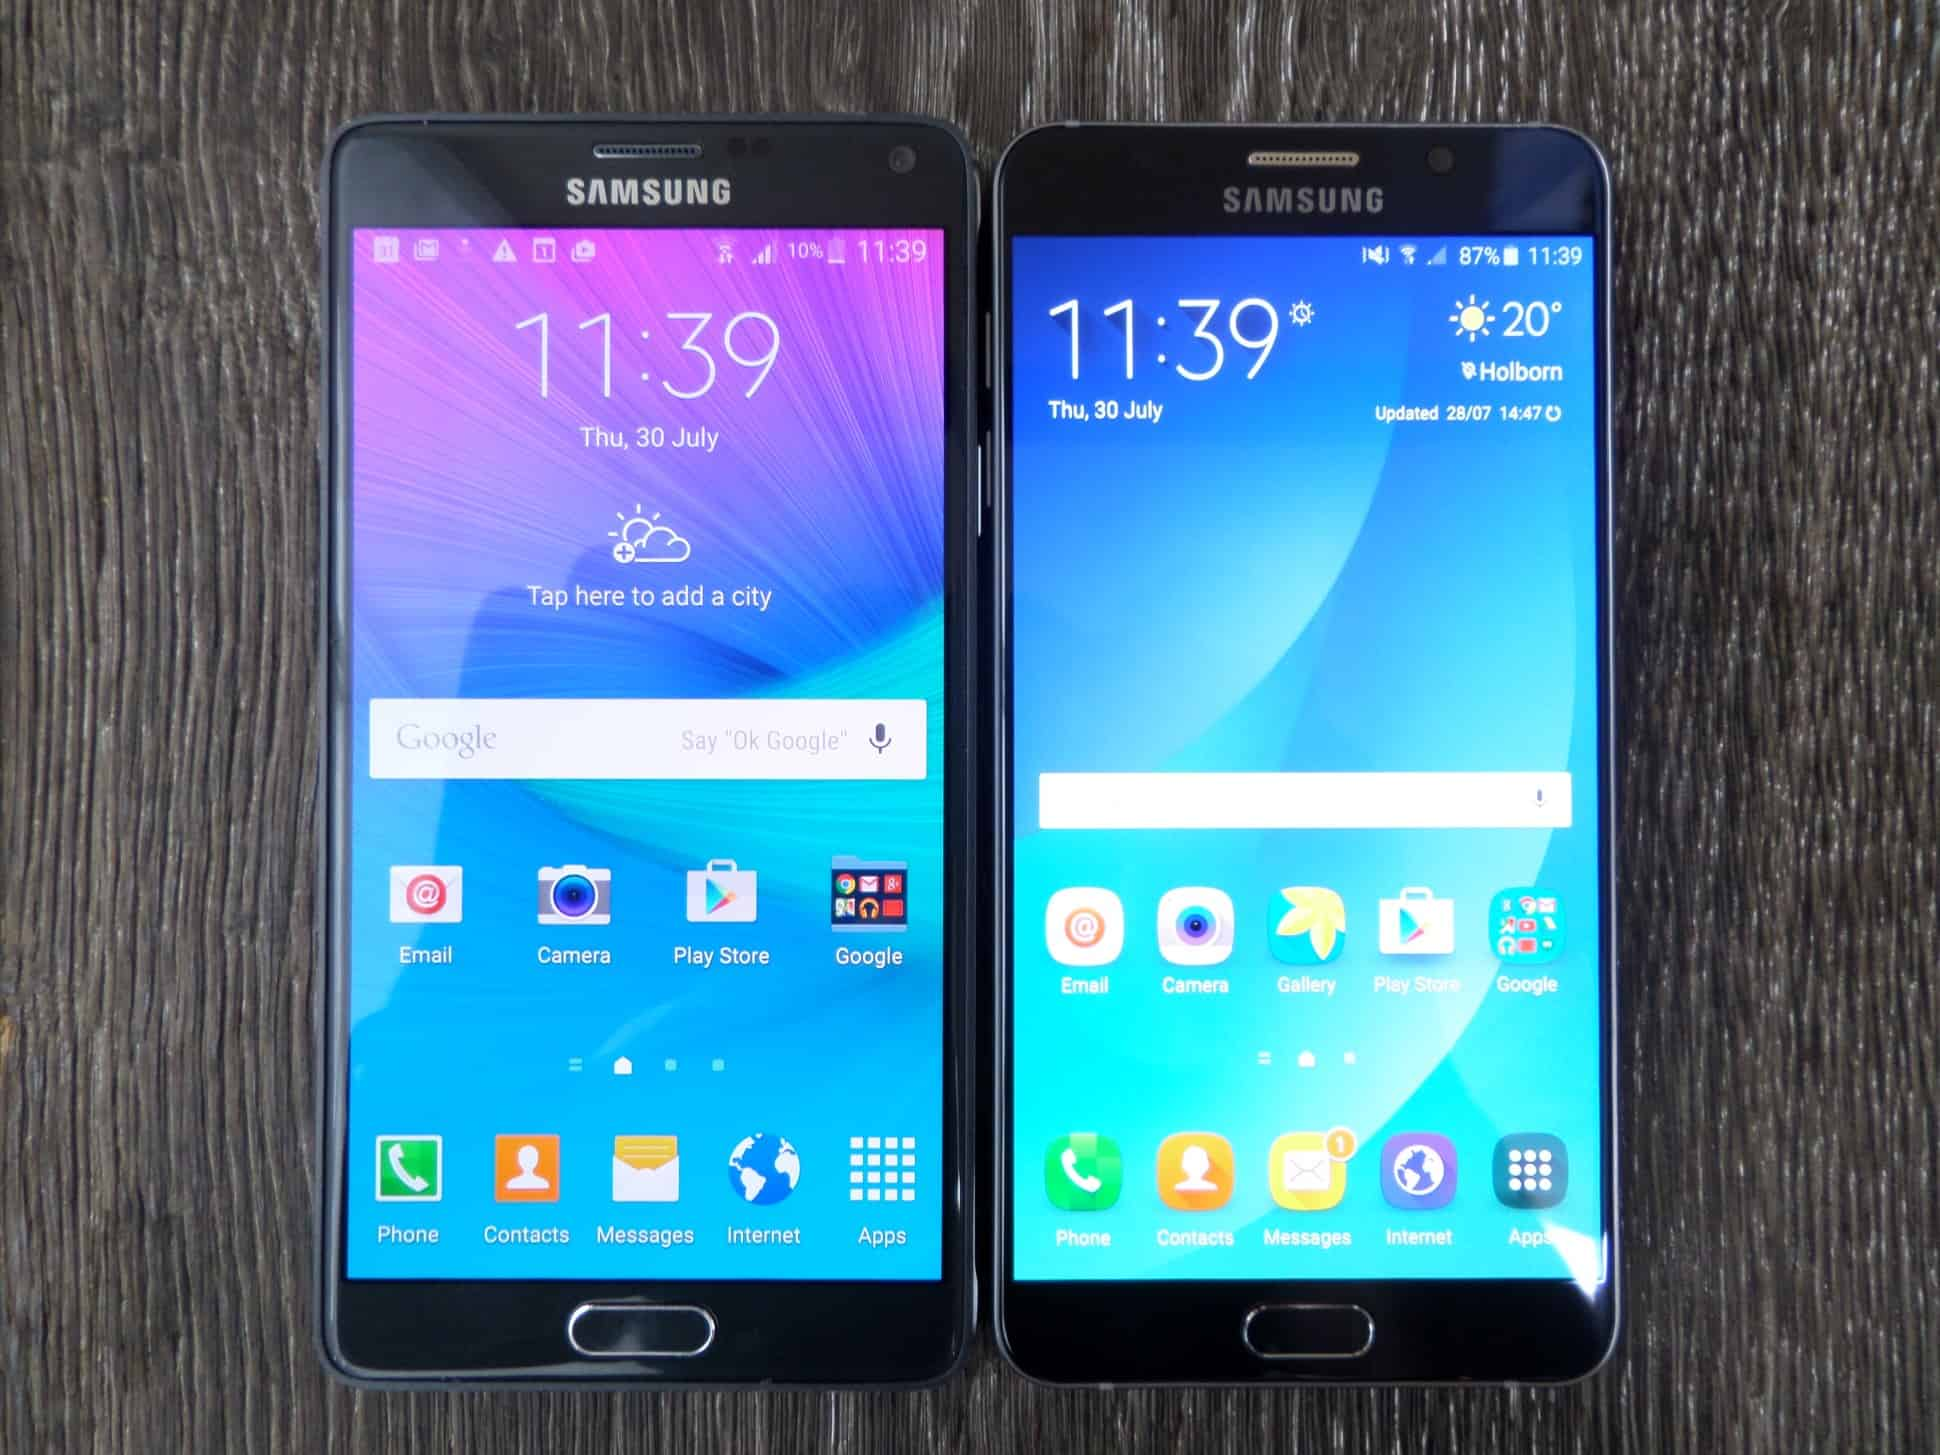 Galaxy Note 5 Vs Galaxy Note 4 Comparision Amp Notable